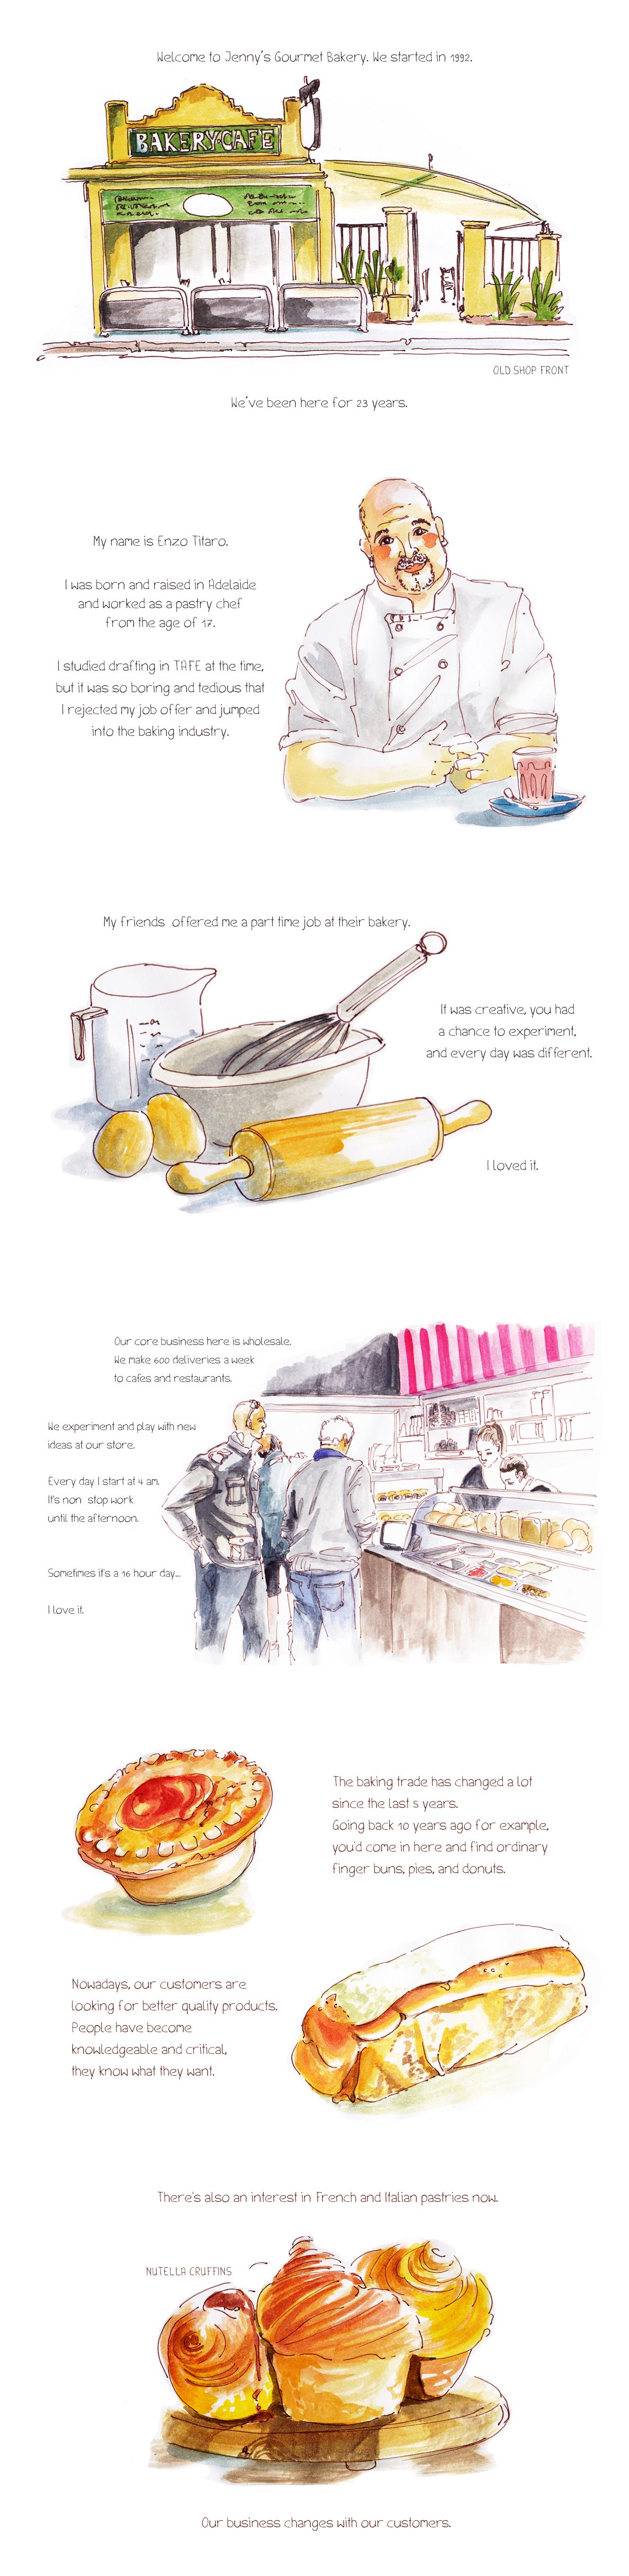 jennys-gourmet-bakery-elaine-cheng-interview-1.jpg